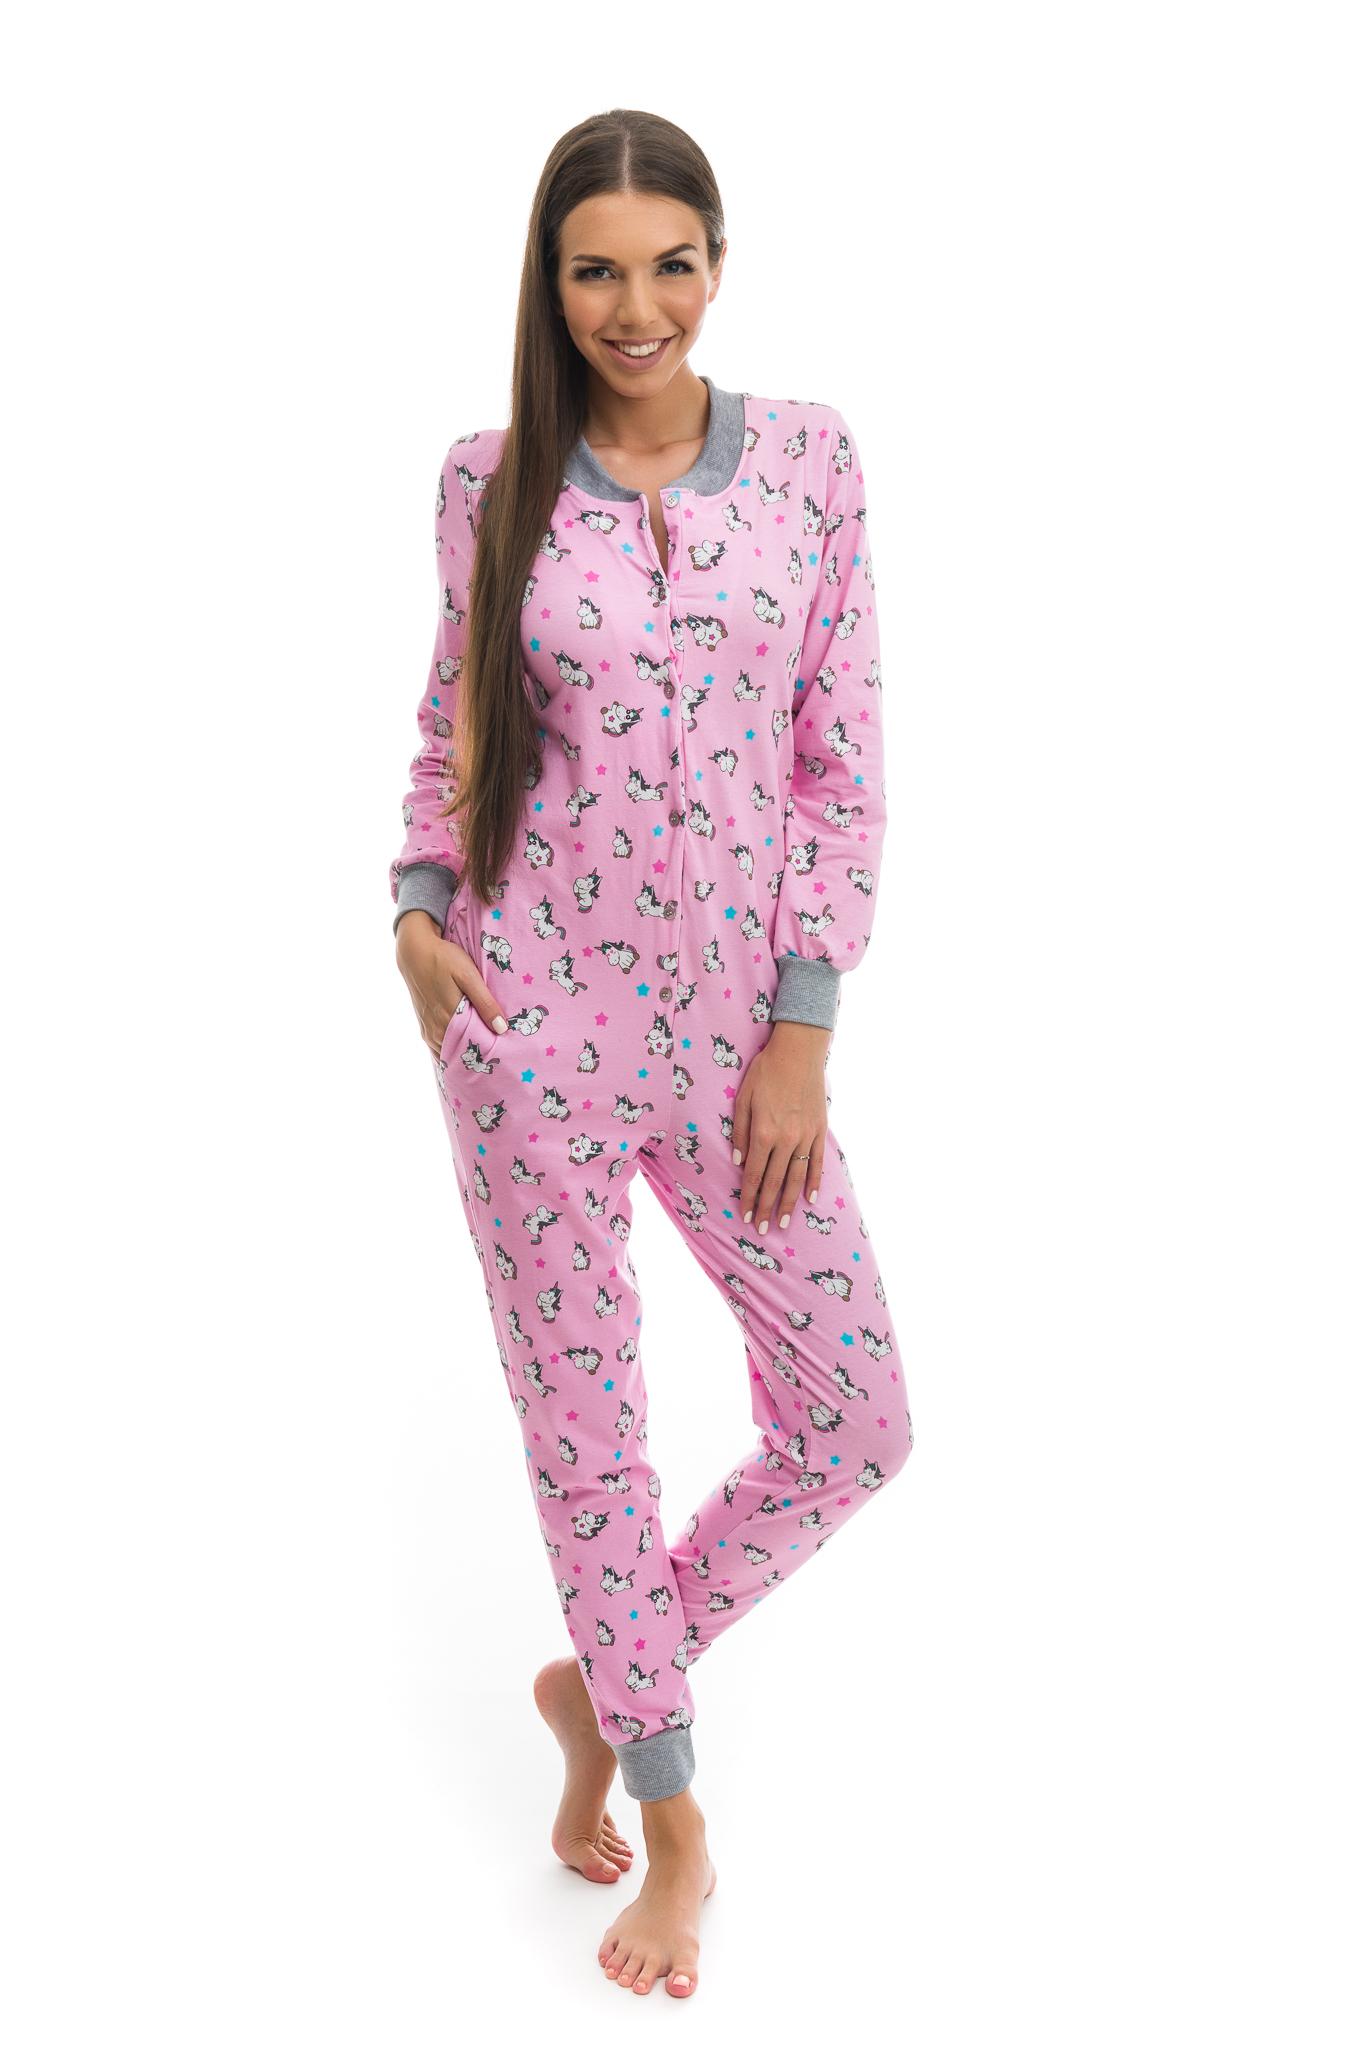 b678a1e41 POPPY Pez Unikornis mintás pamut pizsama-overál